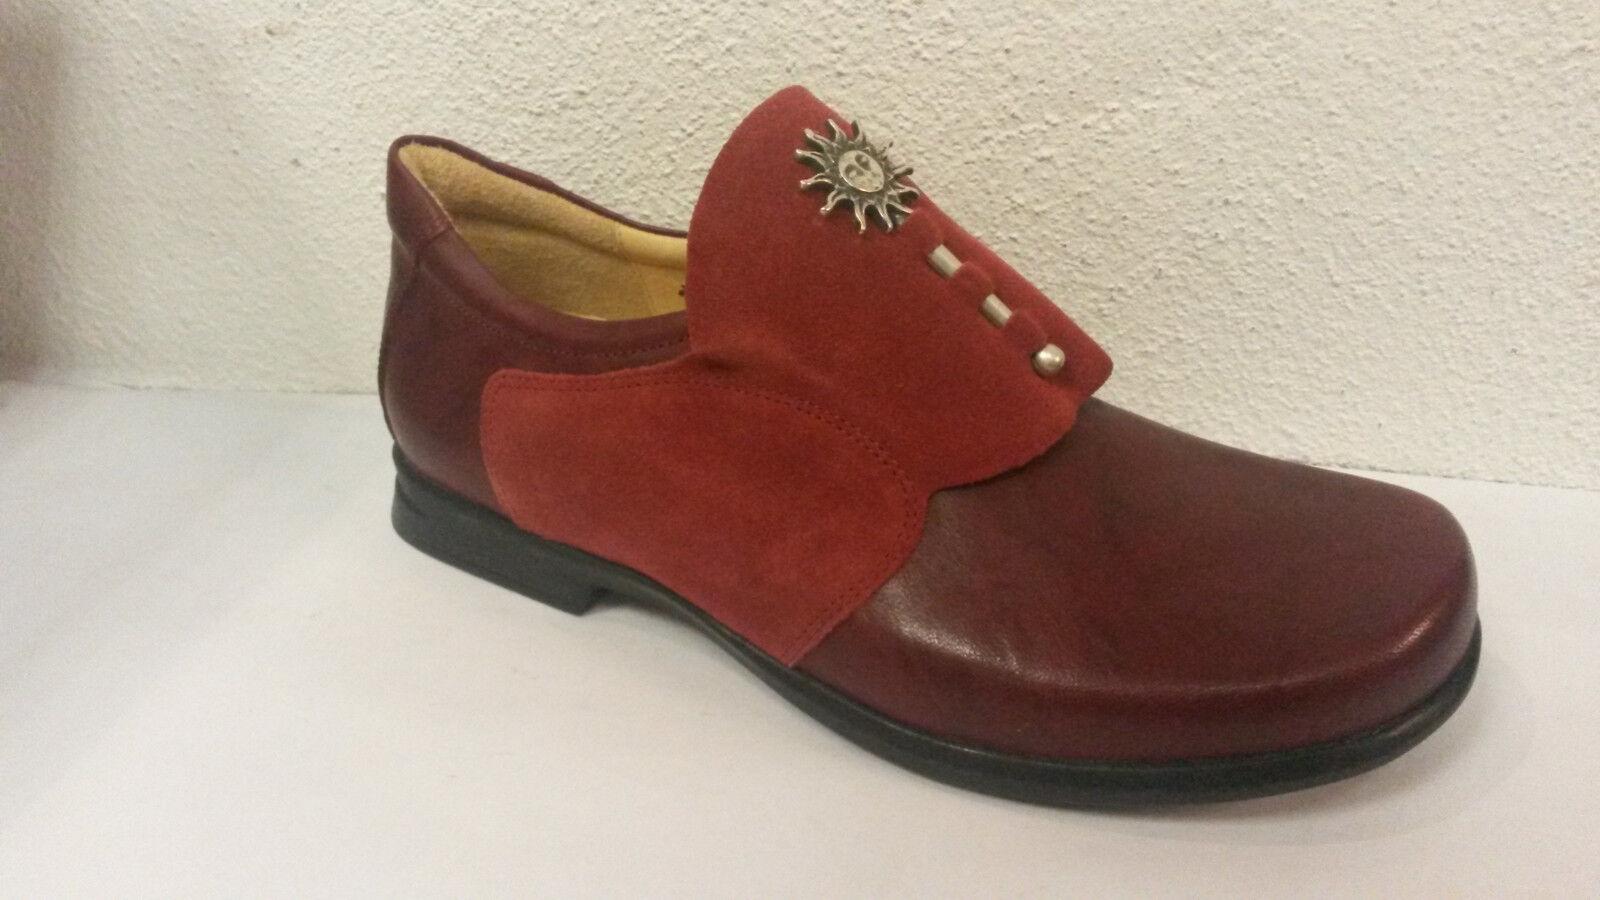 Think! Schuh Modell Pensa roter Slipper Sonne - Mond + THINK Papiertüte